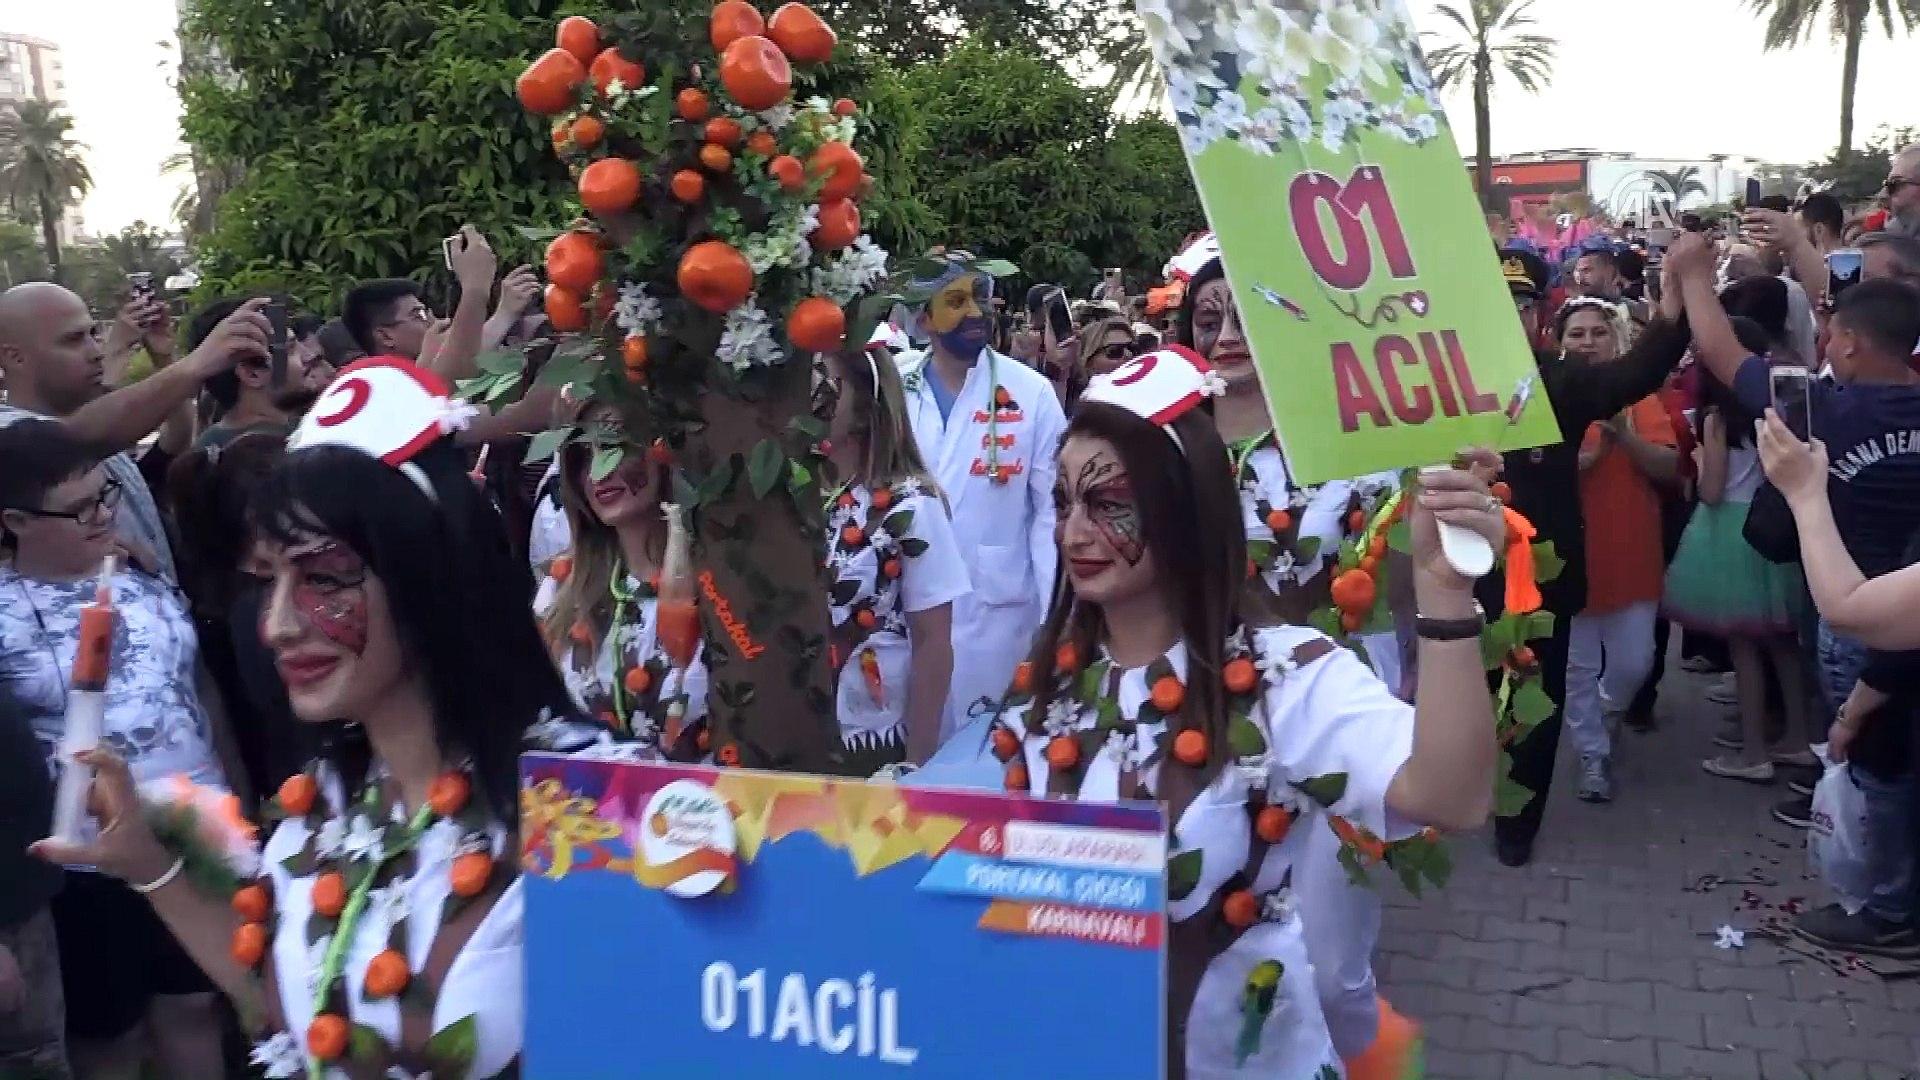 Adana 6 Uluslararasi Portakal Cicegi Karnavali 2